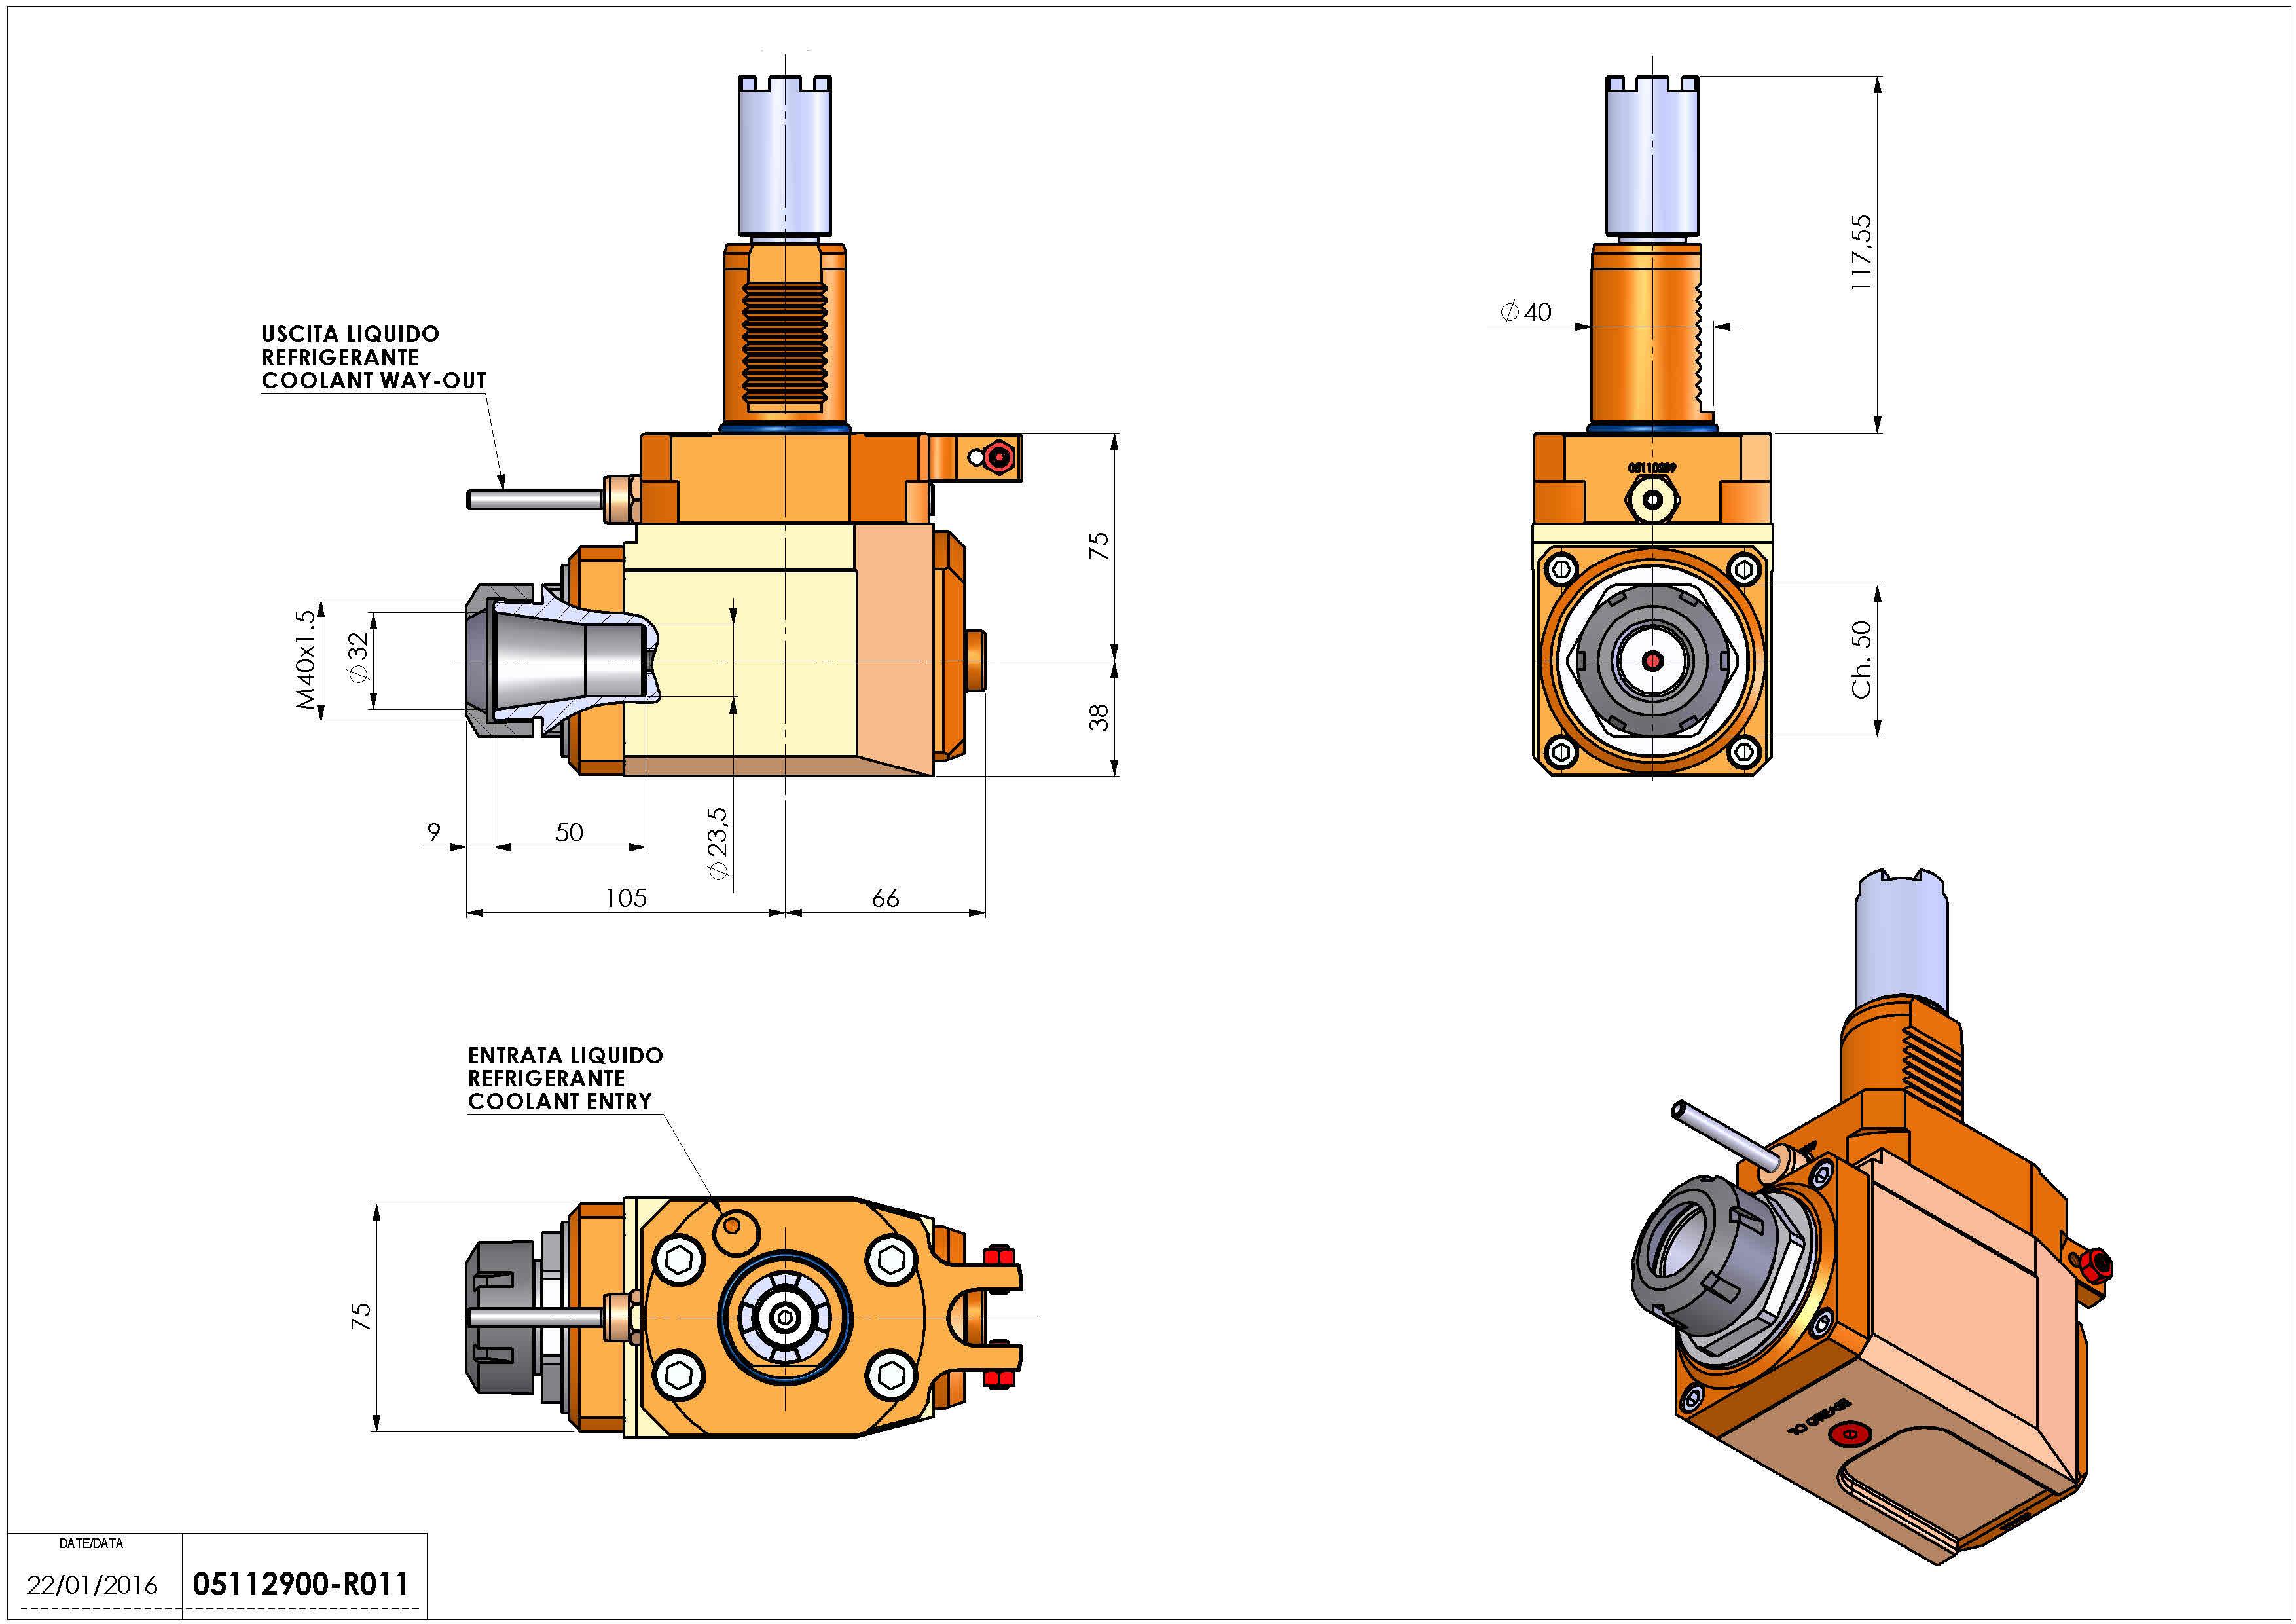 Technical image - LT-A VDI40 ER32 H75 117 HA.